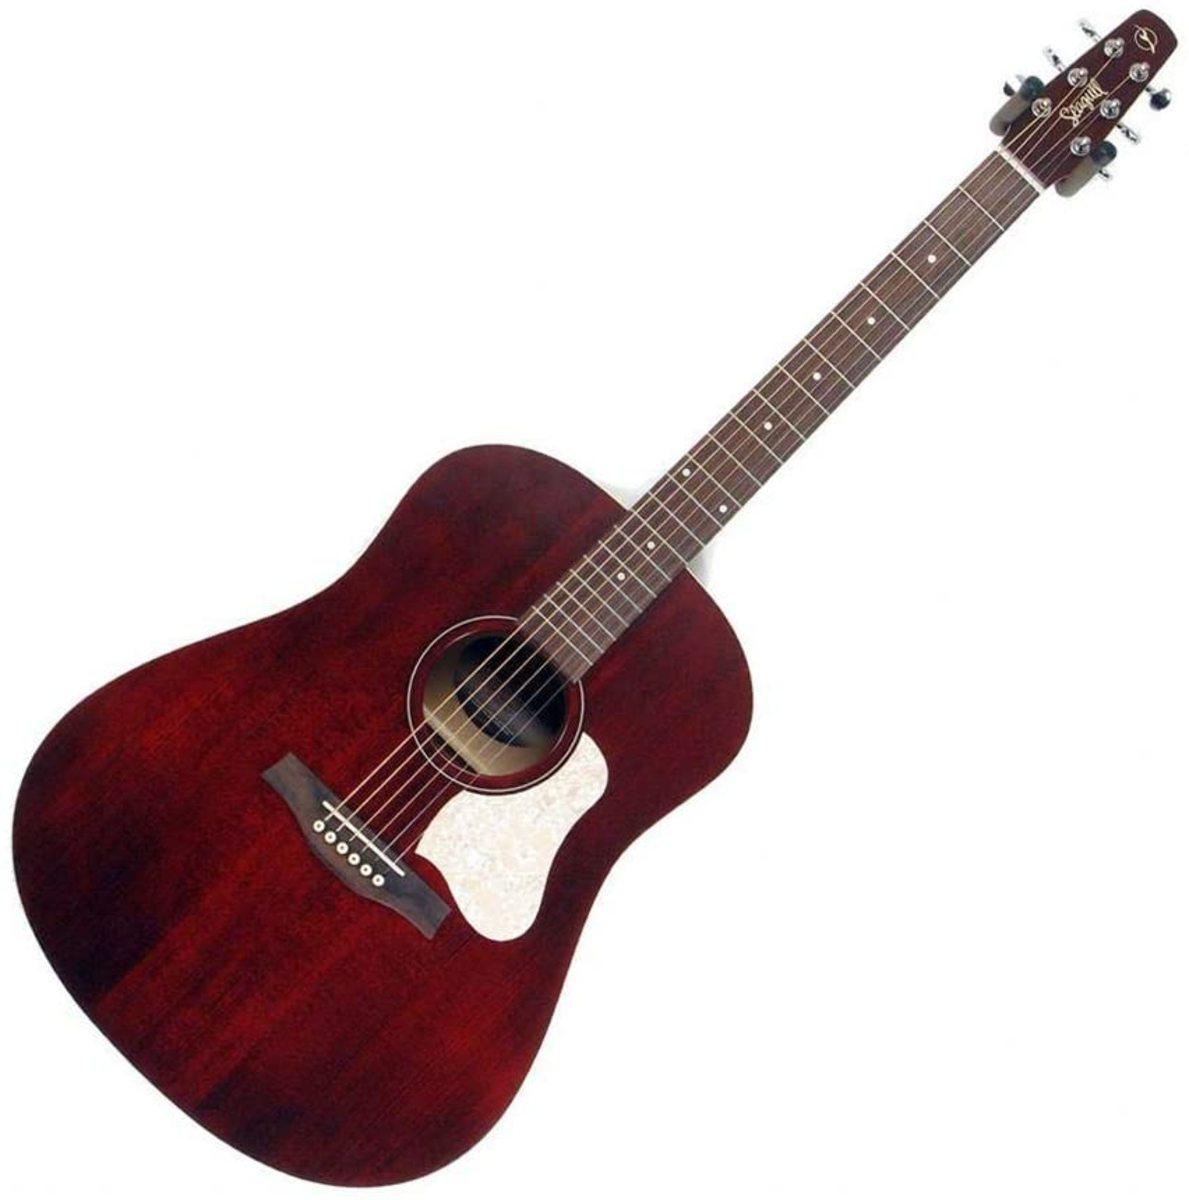 The Seagull S6 Original Acoustic Guitar.